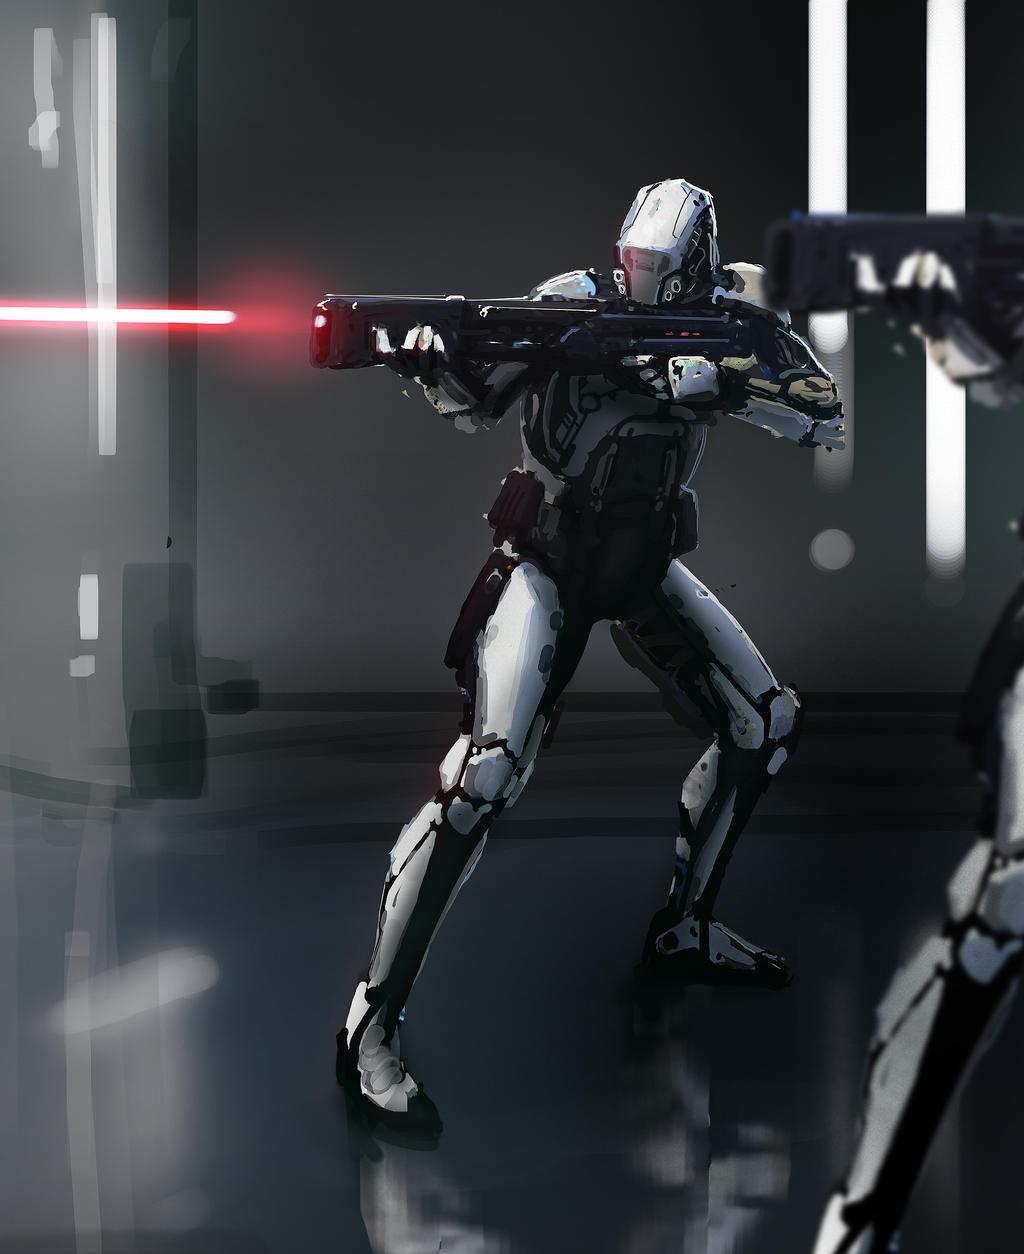 Stormtrooper by MrTomLong